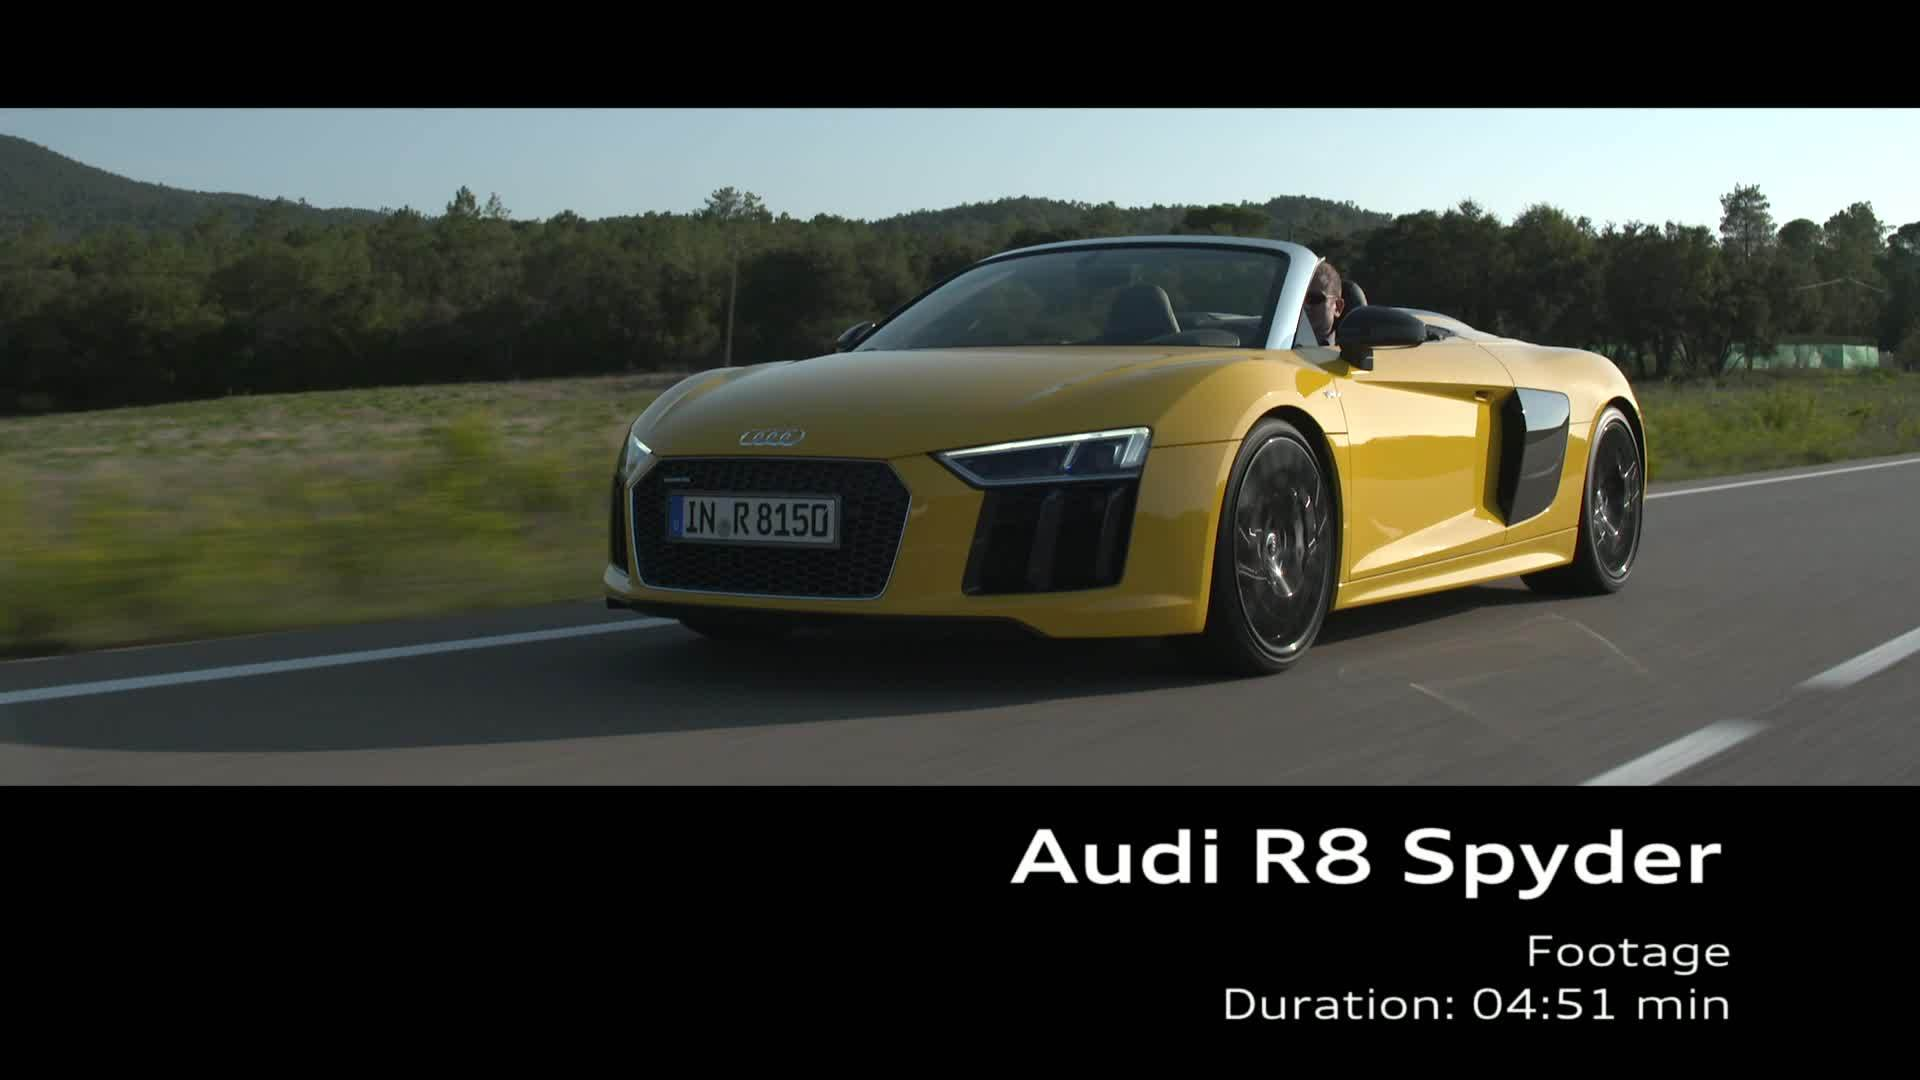 Audi R8 Spyder Footage Vegas Yellow